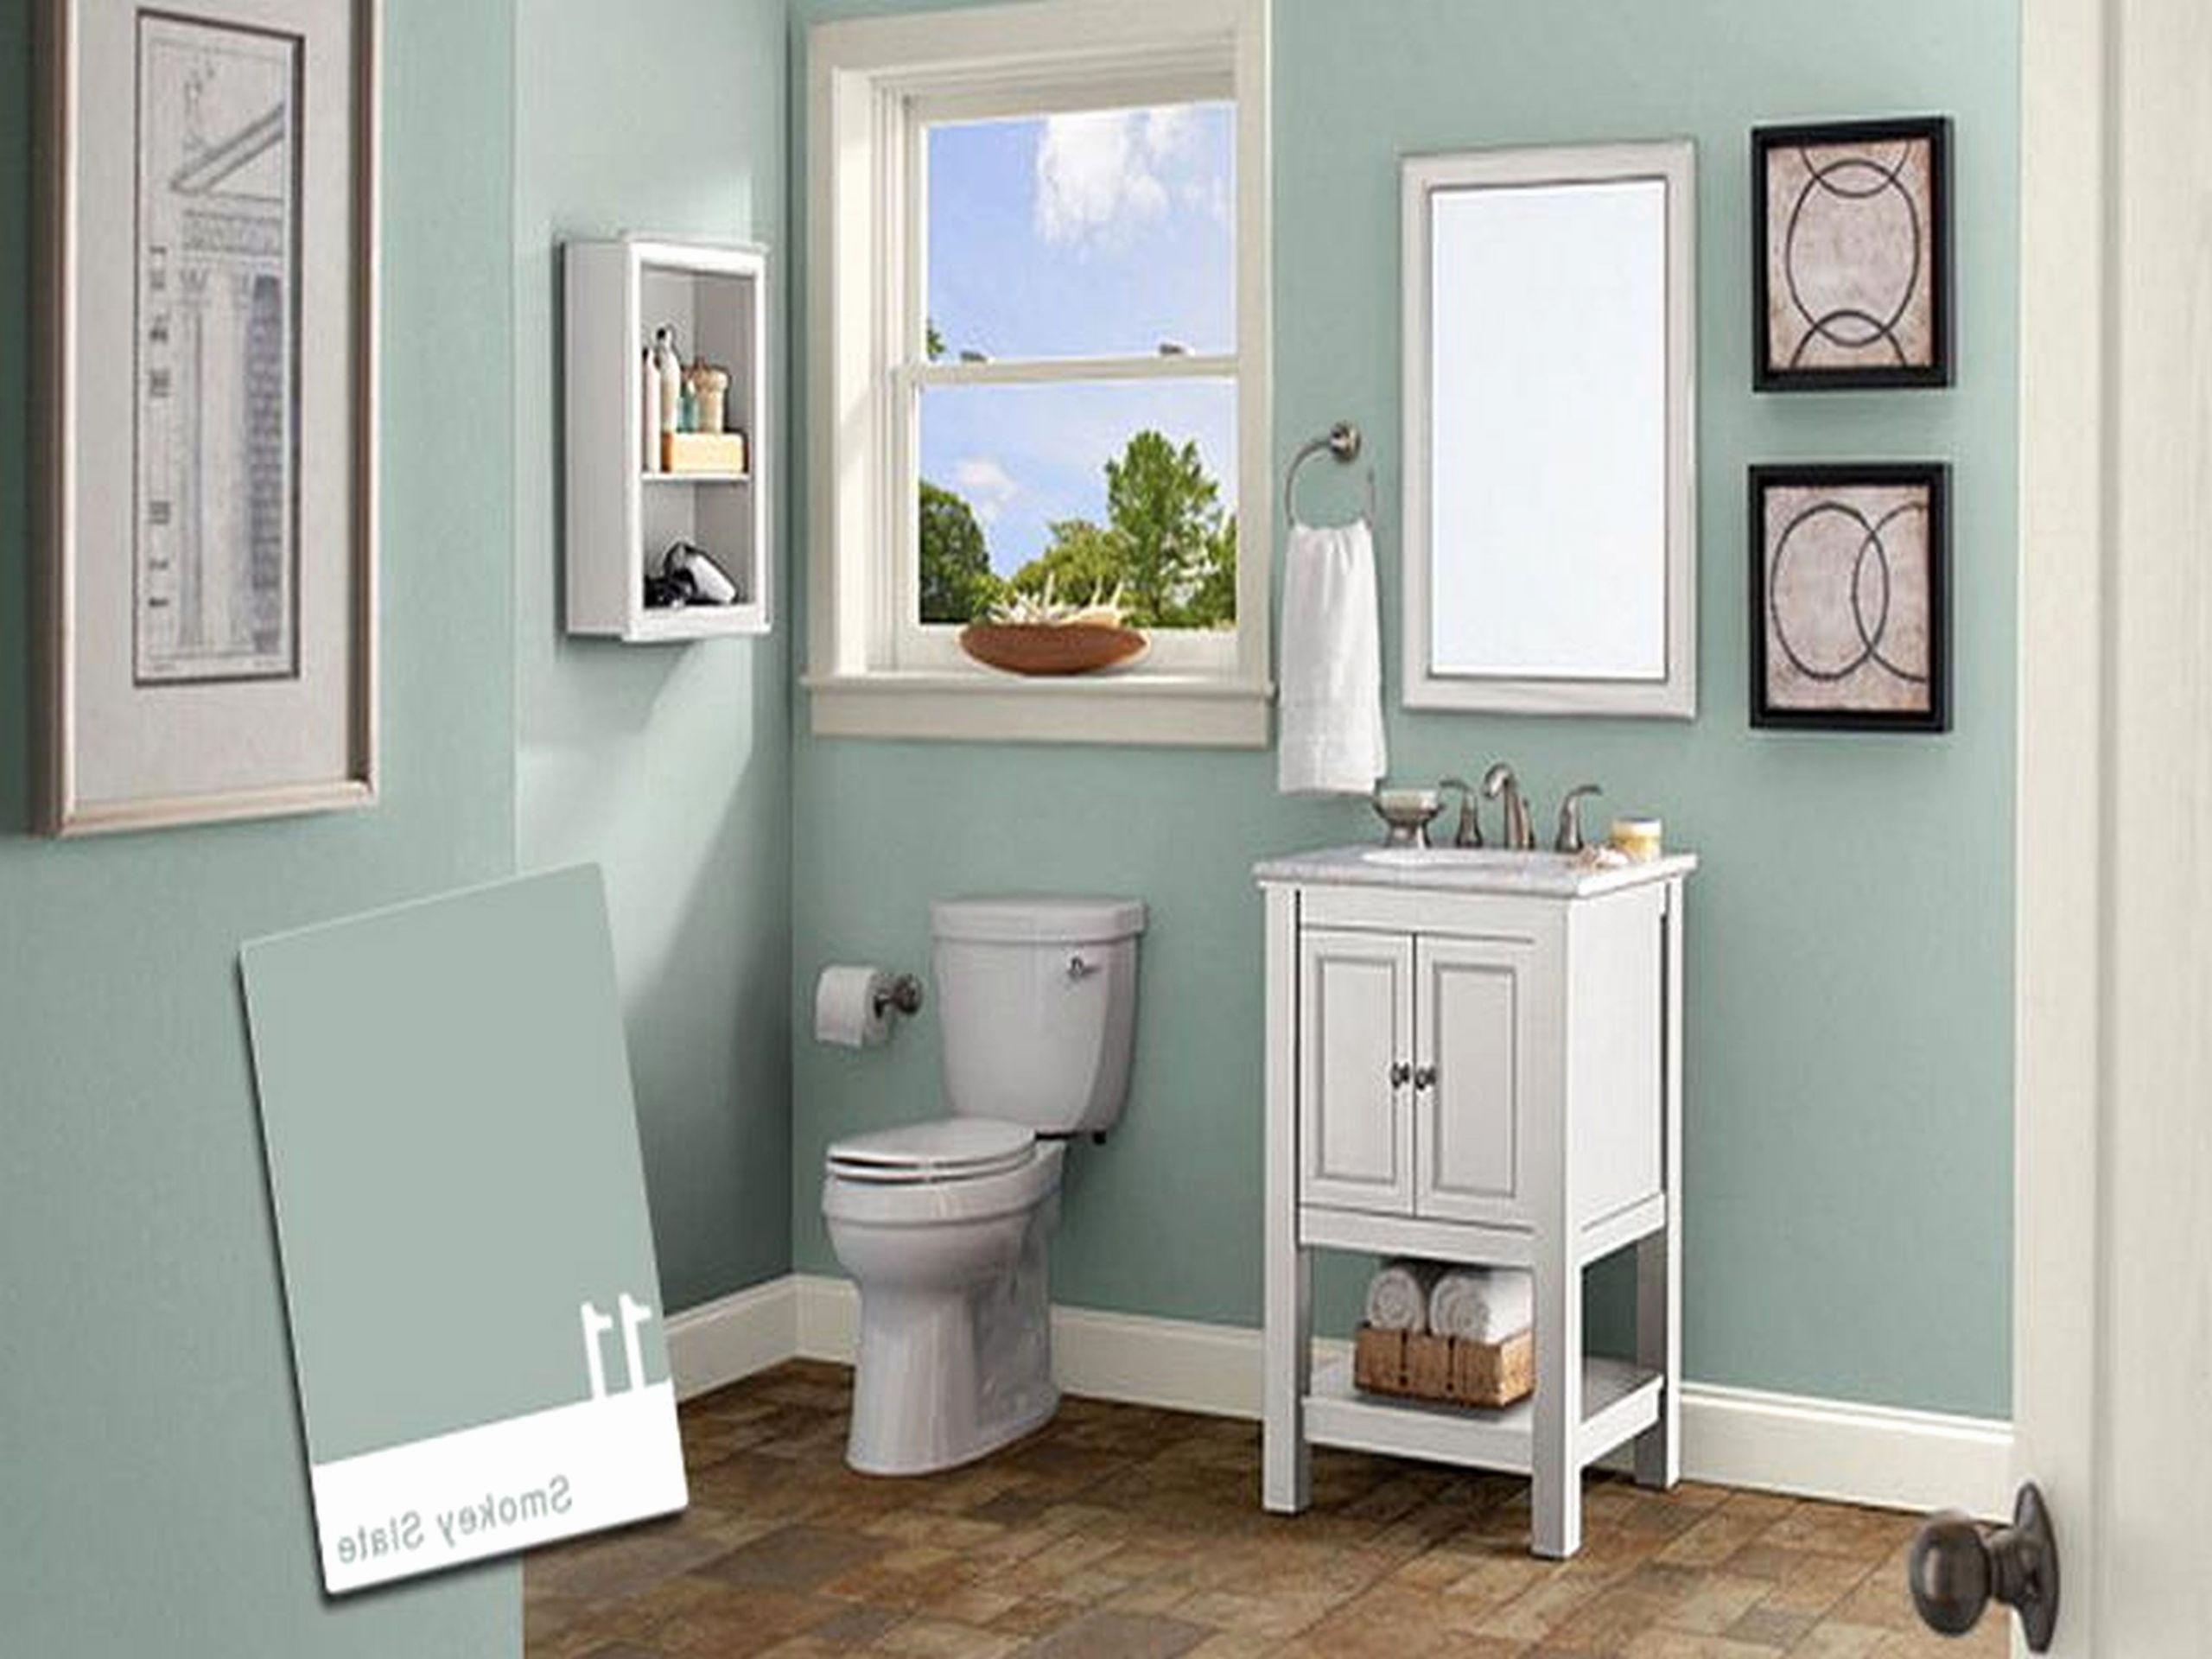 Master Bedrooms Wall Paint Ideas Fresh 51 Good Bathroom Colors 111 World S Best Bathroom Col In 2020 Bathroom Paint Colors Bathroom Decor Apartment Teal Bathroom Decor